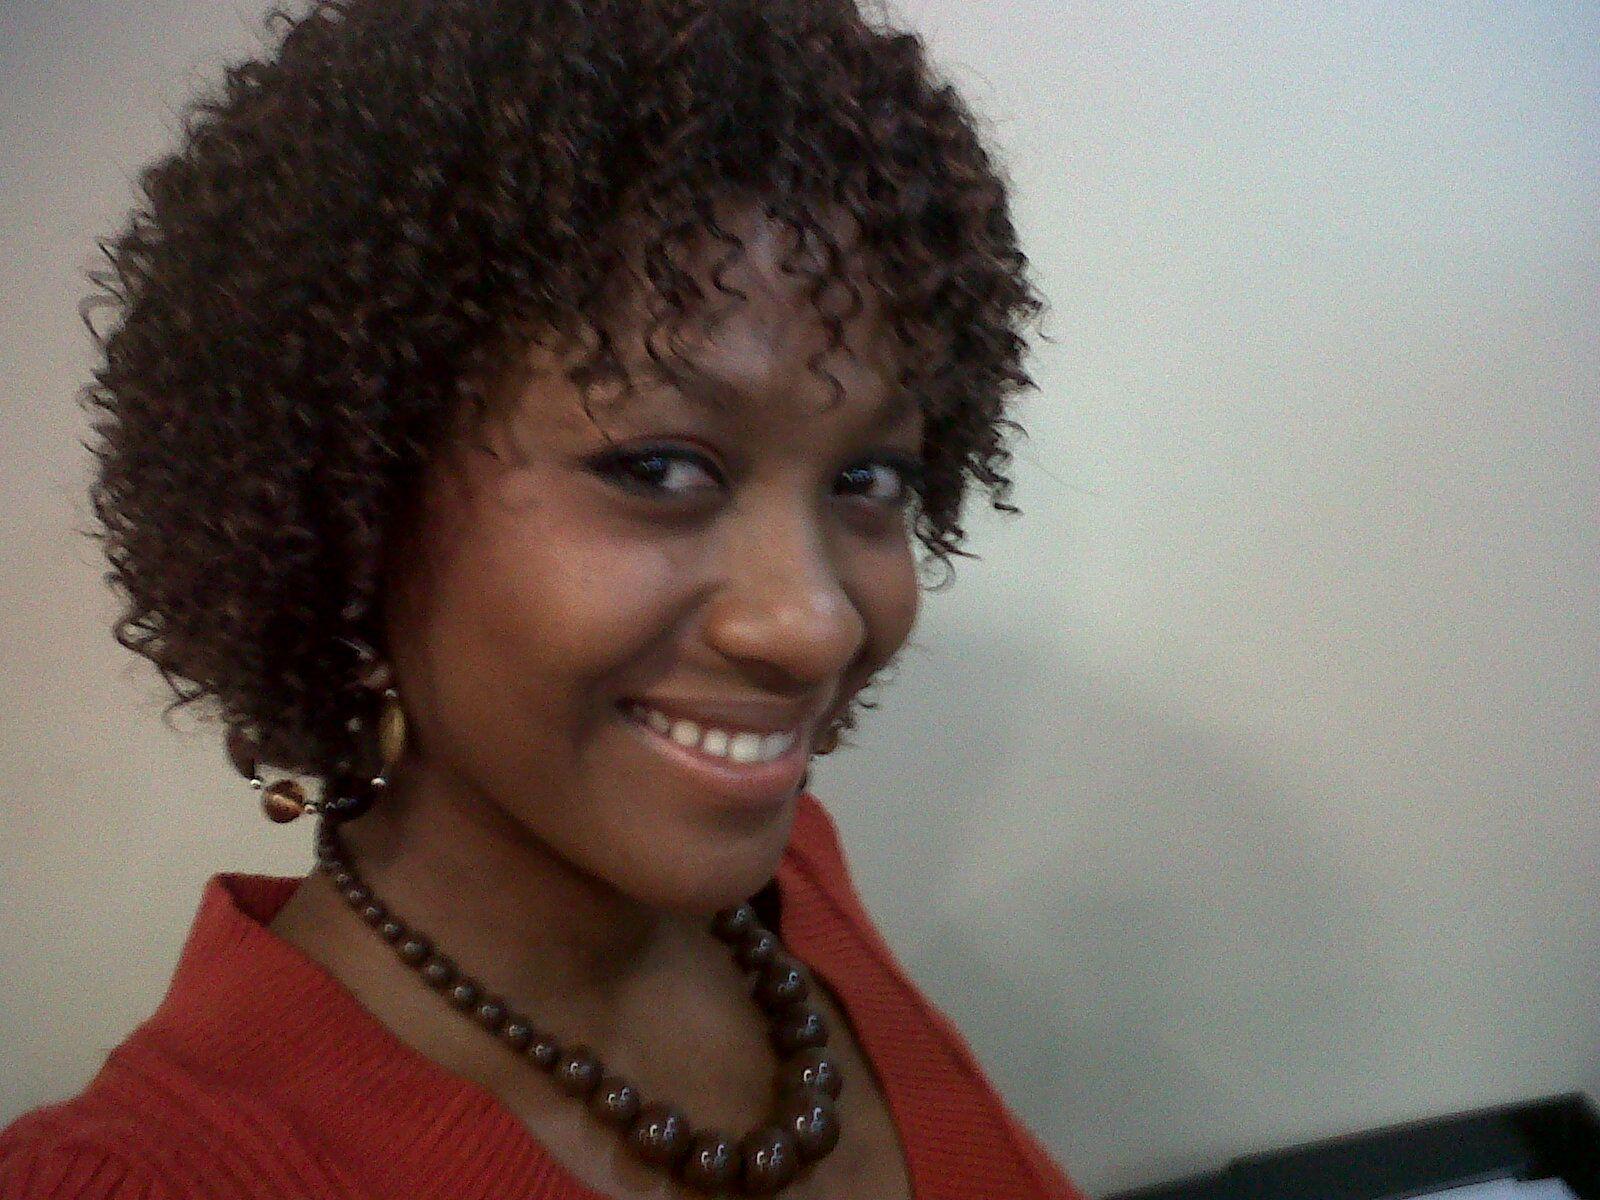 Groovy Curls Black Women And Sew On Pinterest Short Hairstyles Gunalazisus